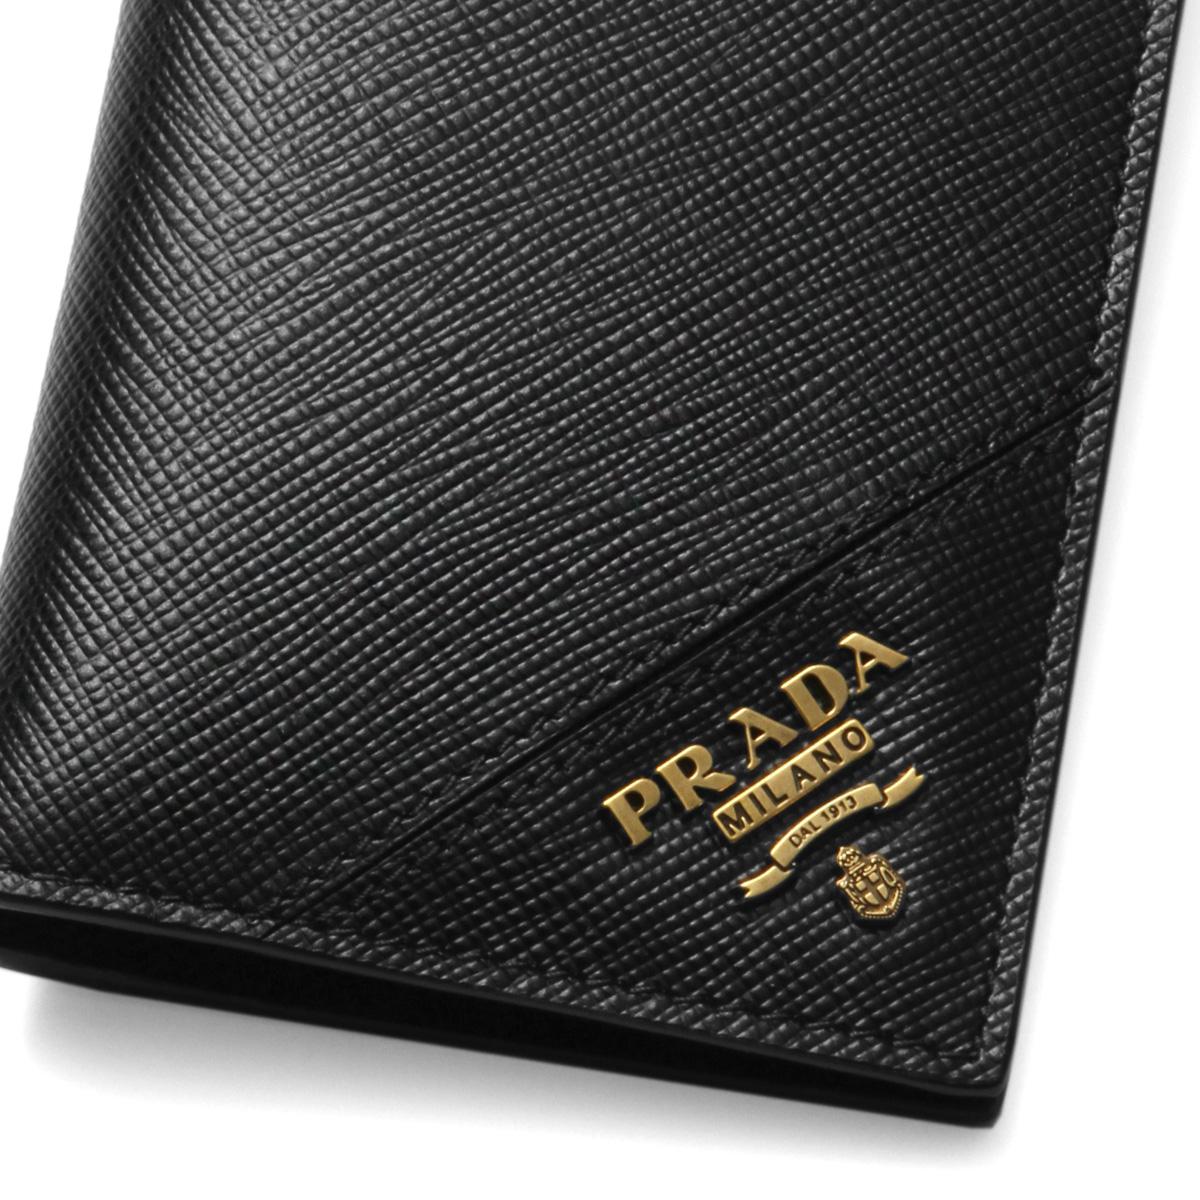 PRADA プラダ   カードケース   SAFFIANO METAL